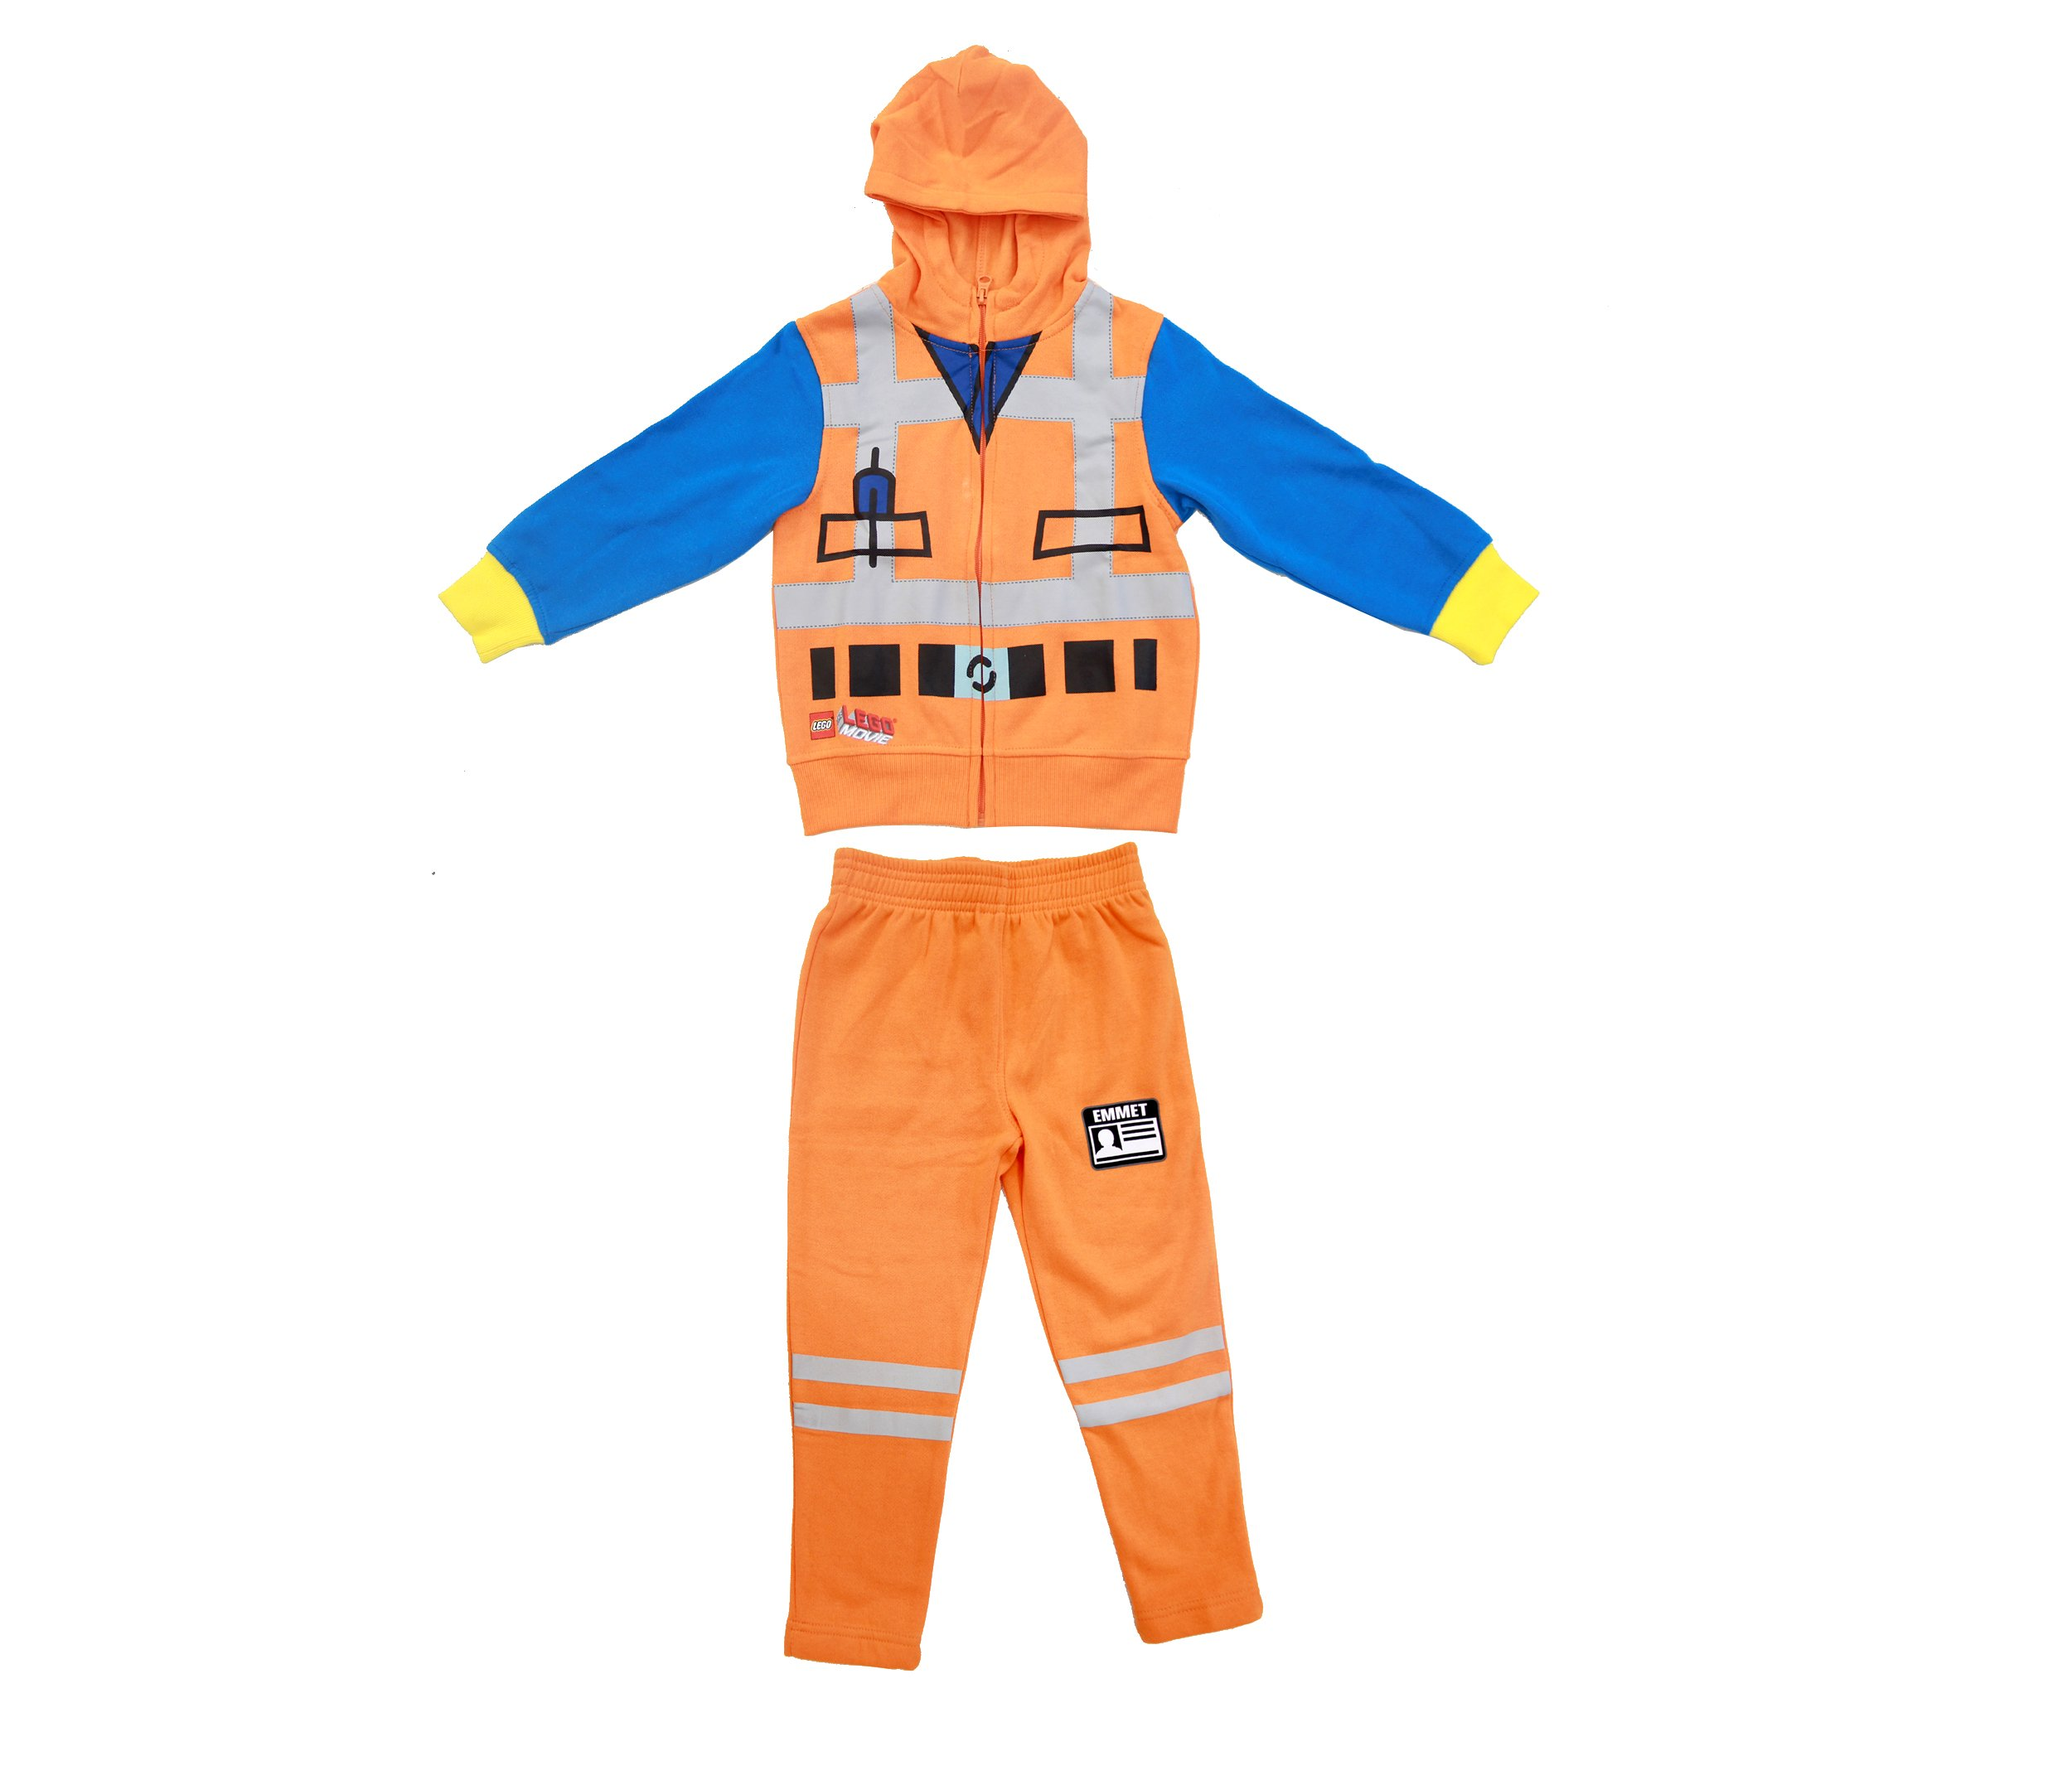 Lego Movie Emmet Orange Boys Two-Piece Zip-Up Costume Hoodie & Sweatpants Set (7)